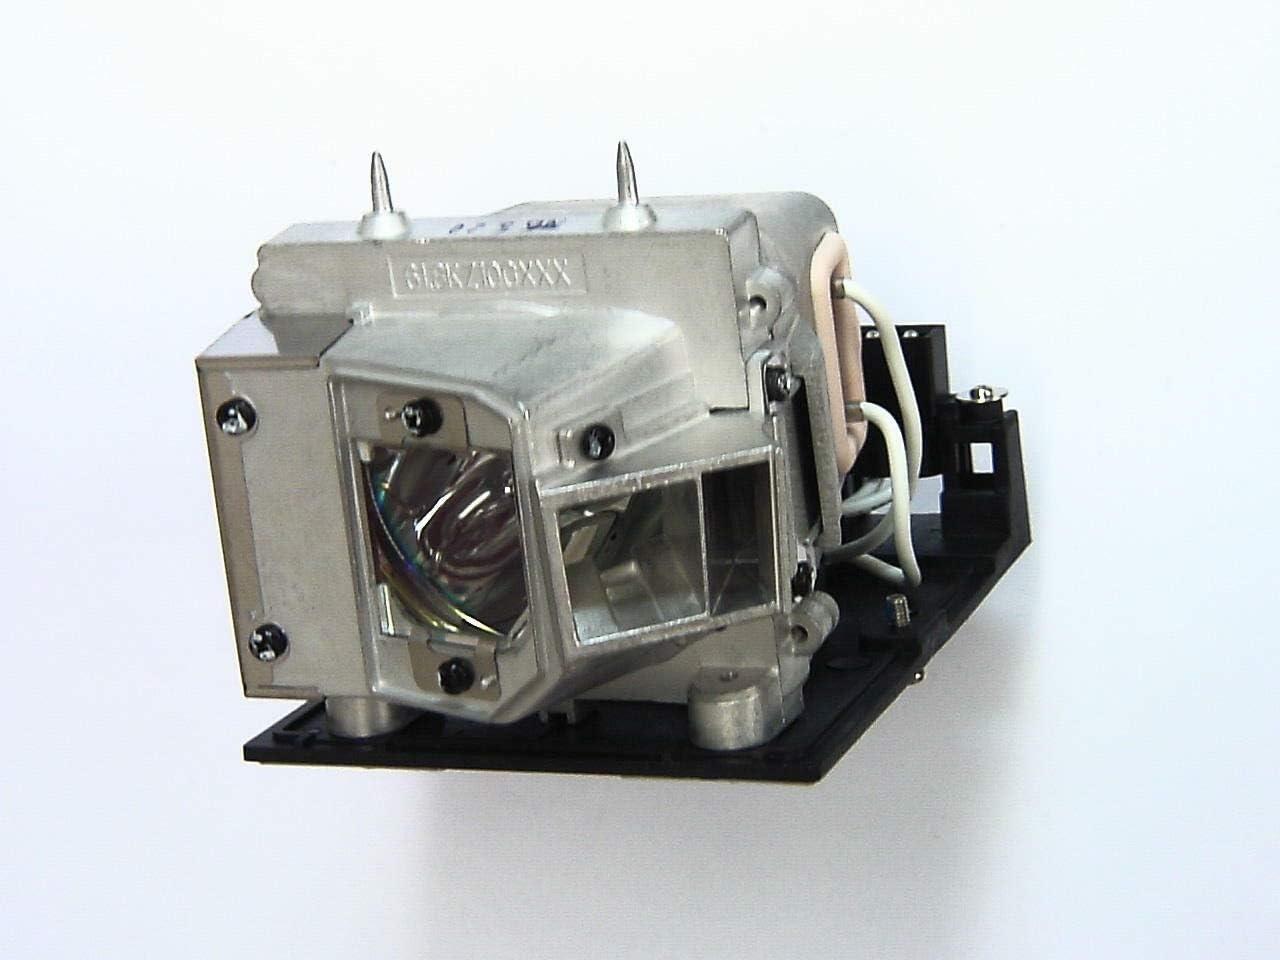 Card Reader Usb2.0//1.1 Port Memory Sdhc Sdxc Tf T-Flash Adapter Random Semoic Micro